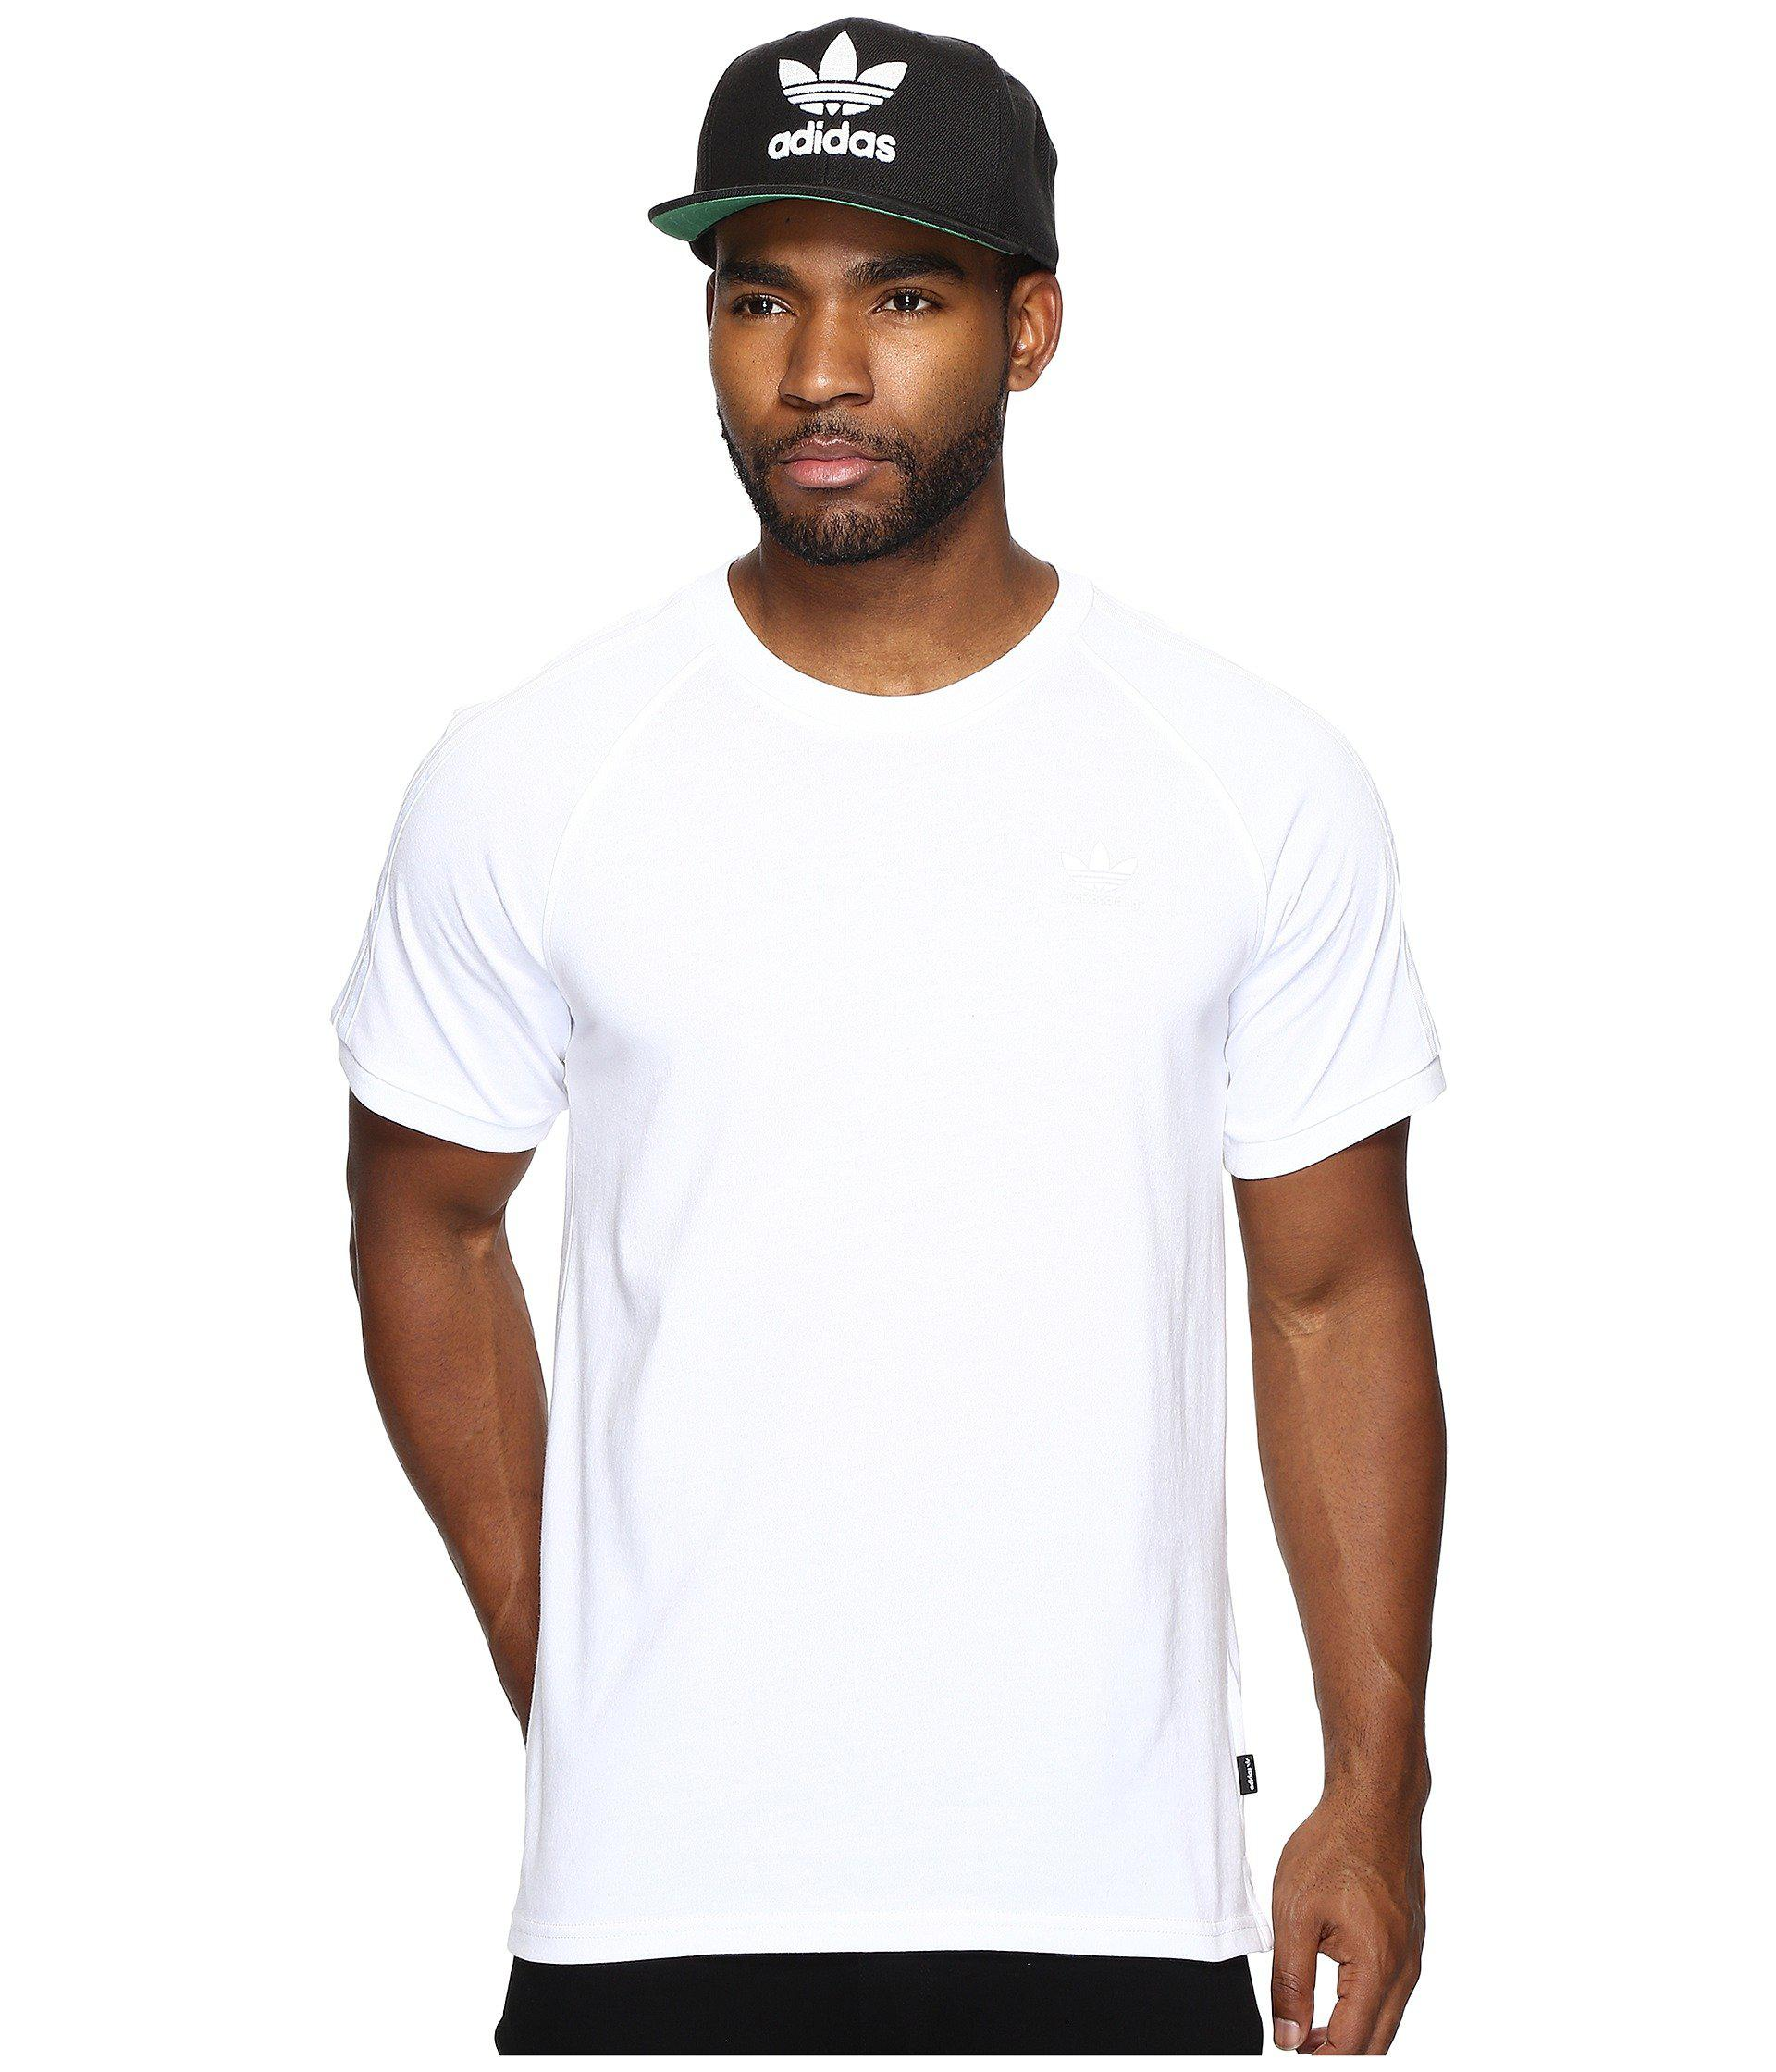 e032533f728 Lyst - adidas Originals California 2.0 Tee (white white) Men s T ...